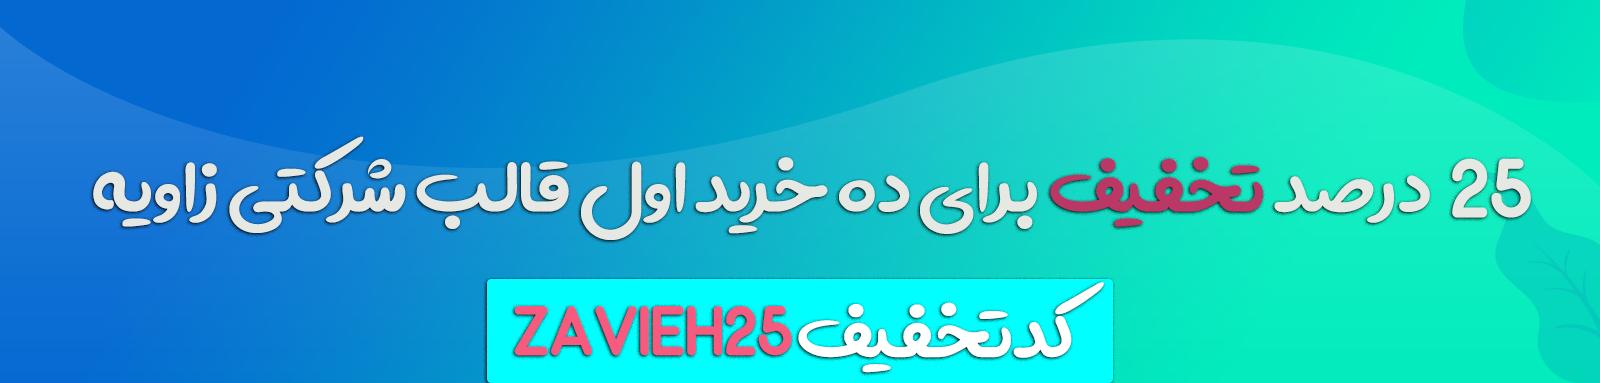 5481 3b32716134744a7a3b0f48064 - قالب شرکتی HTML زاویه | قالب Zavieh